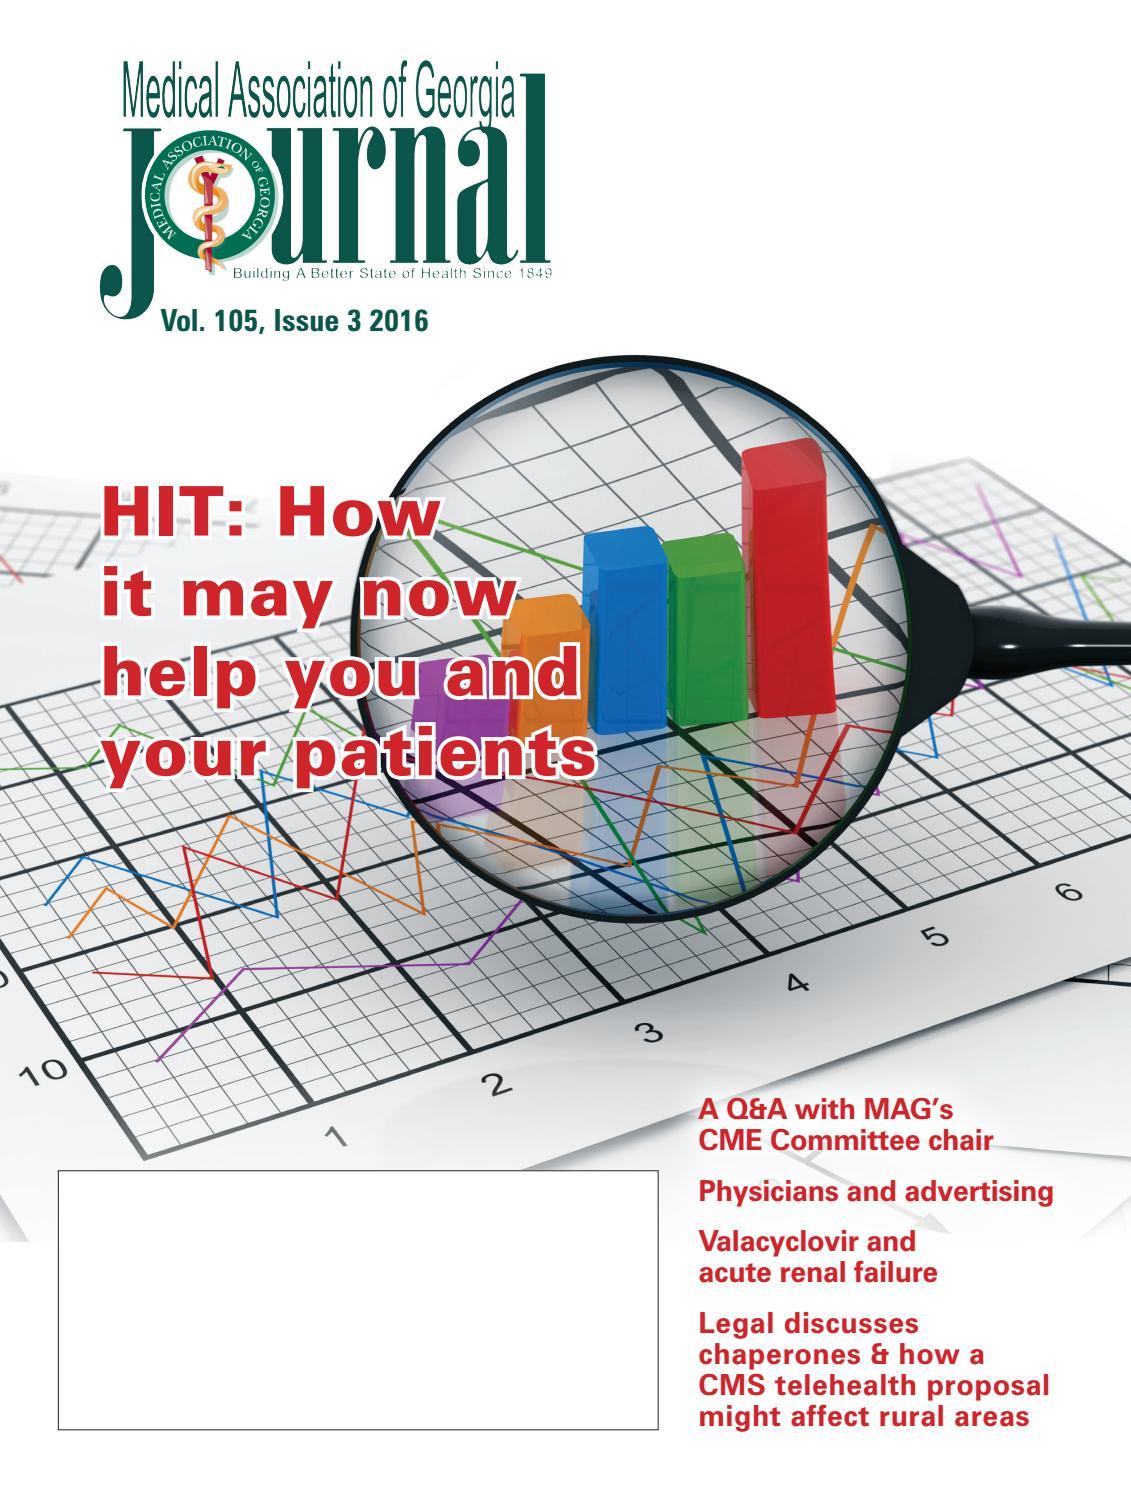 Medical Association of Georgia Journal by PubMan, Inc. - issuu